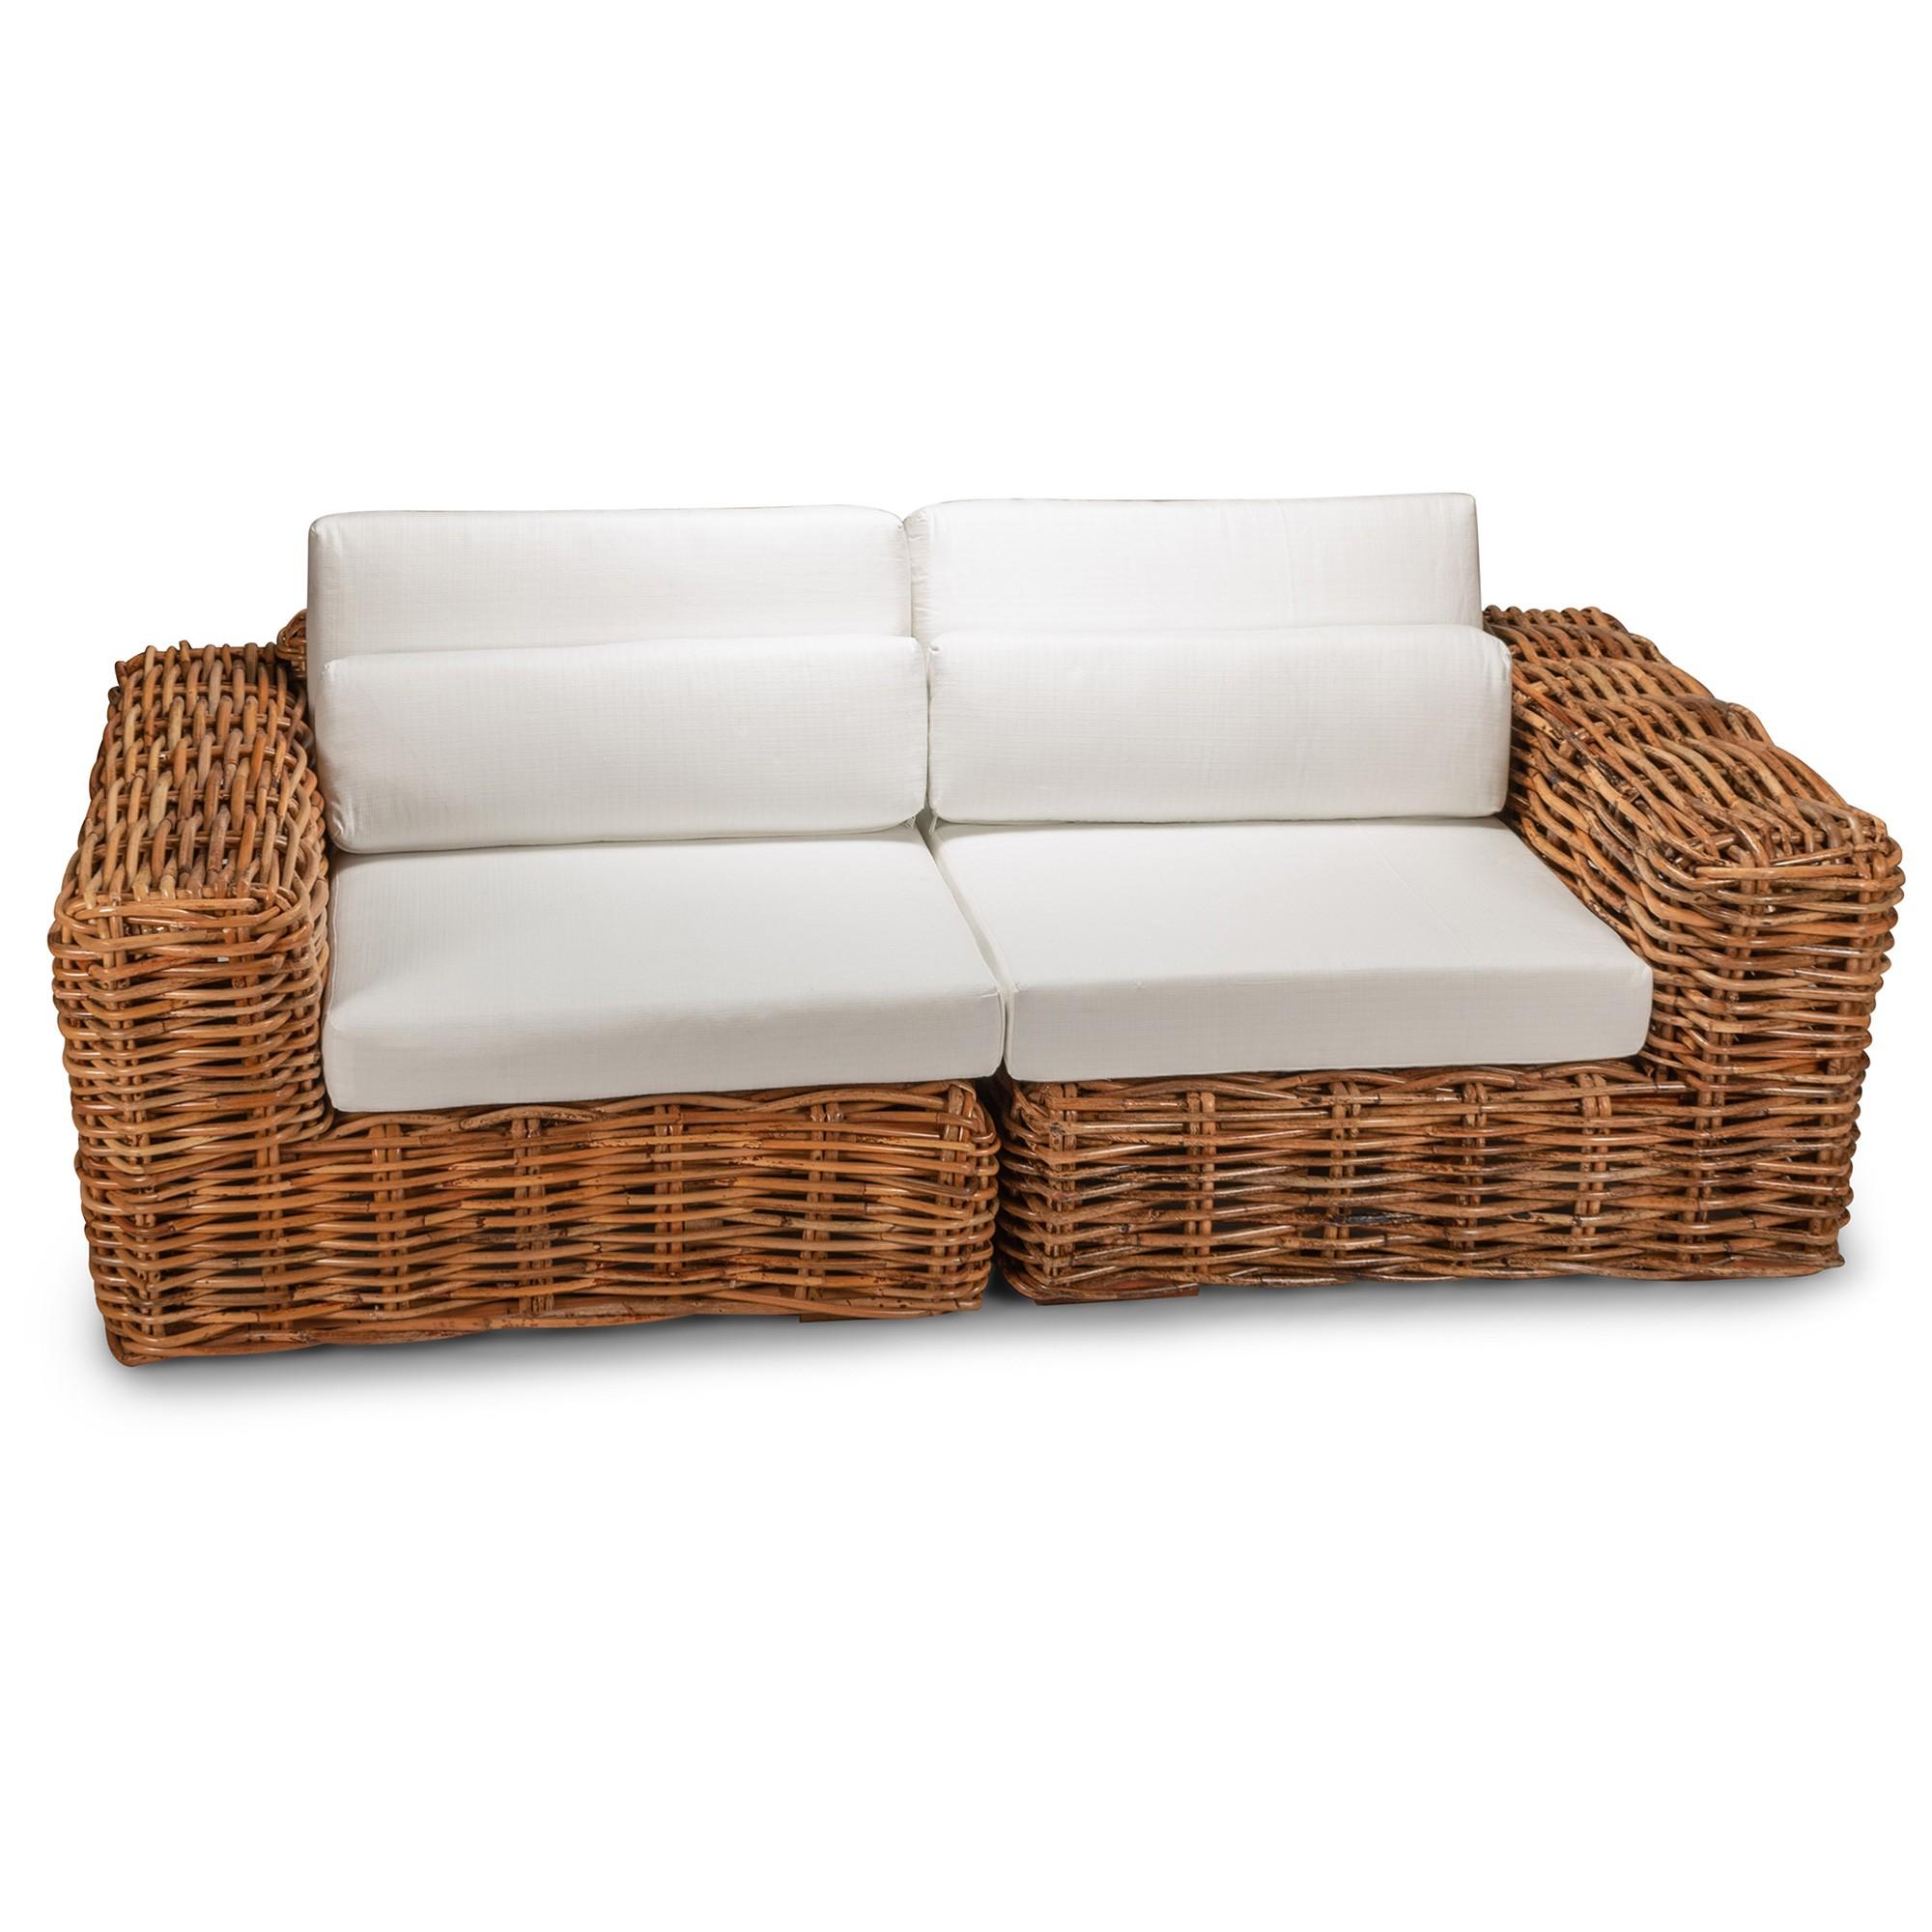 Bowen Rattan Sofa, 2.5 Seater